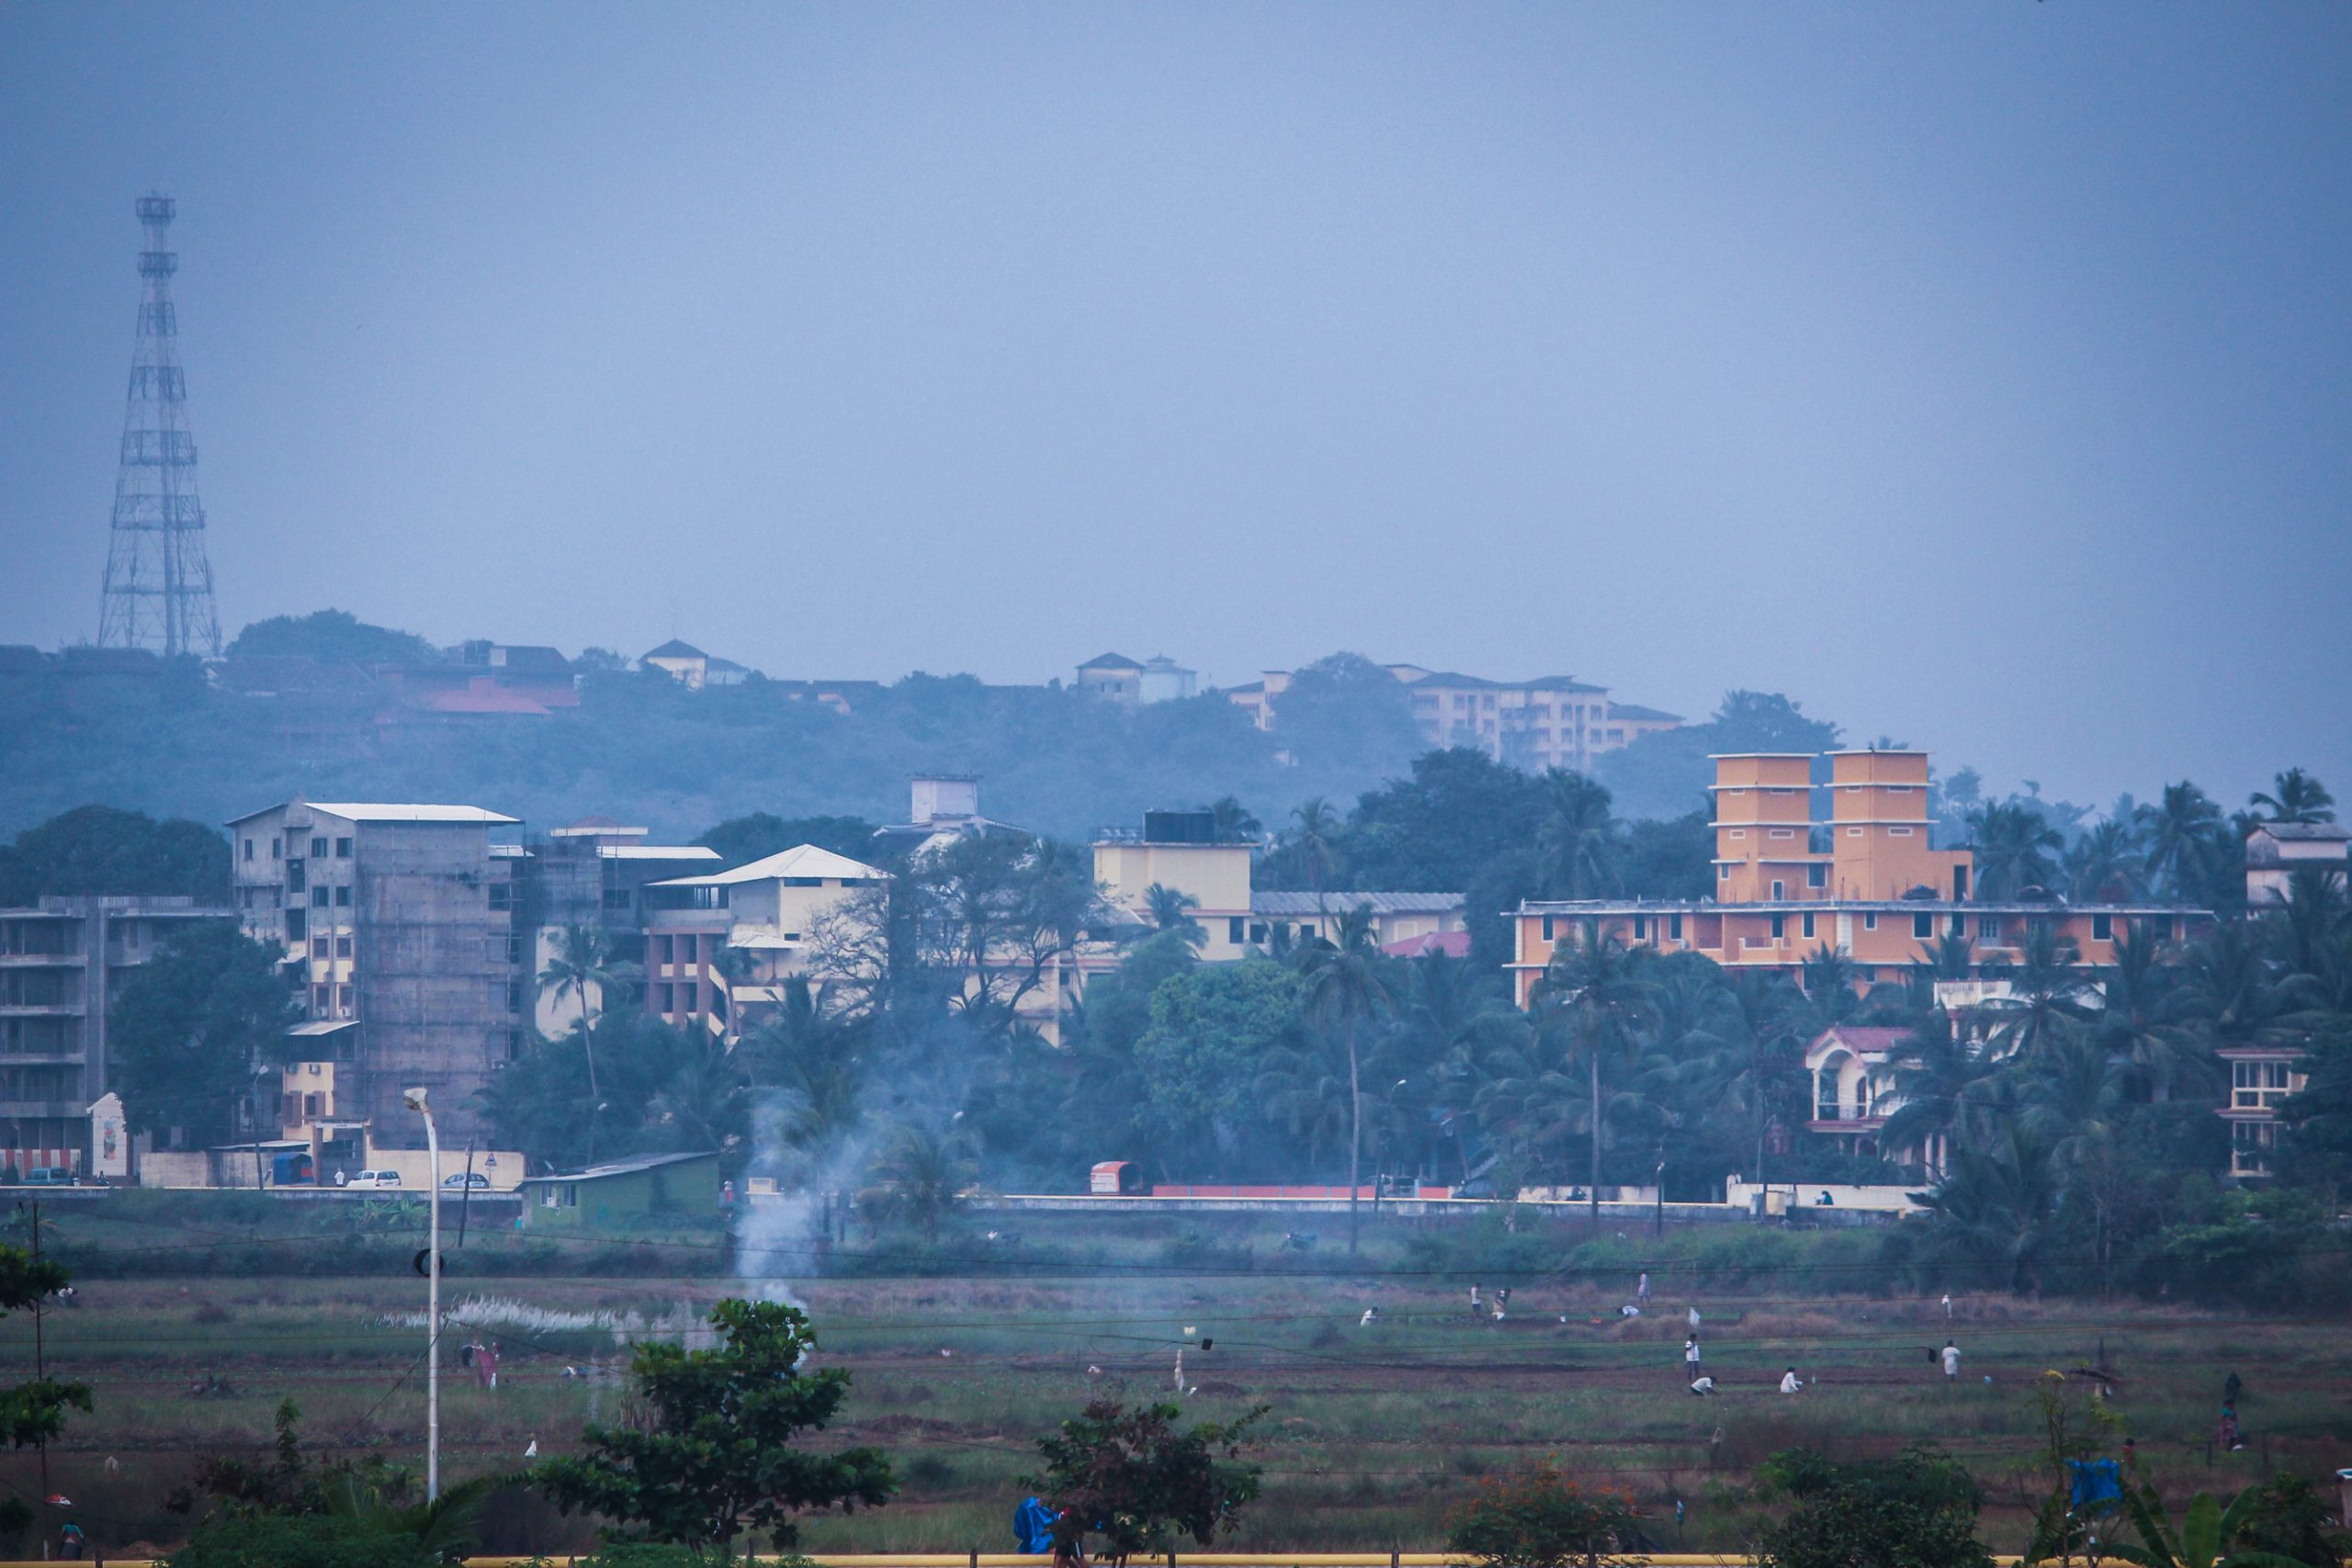 Landscape of a city